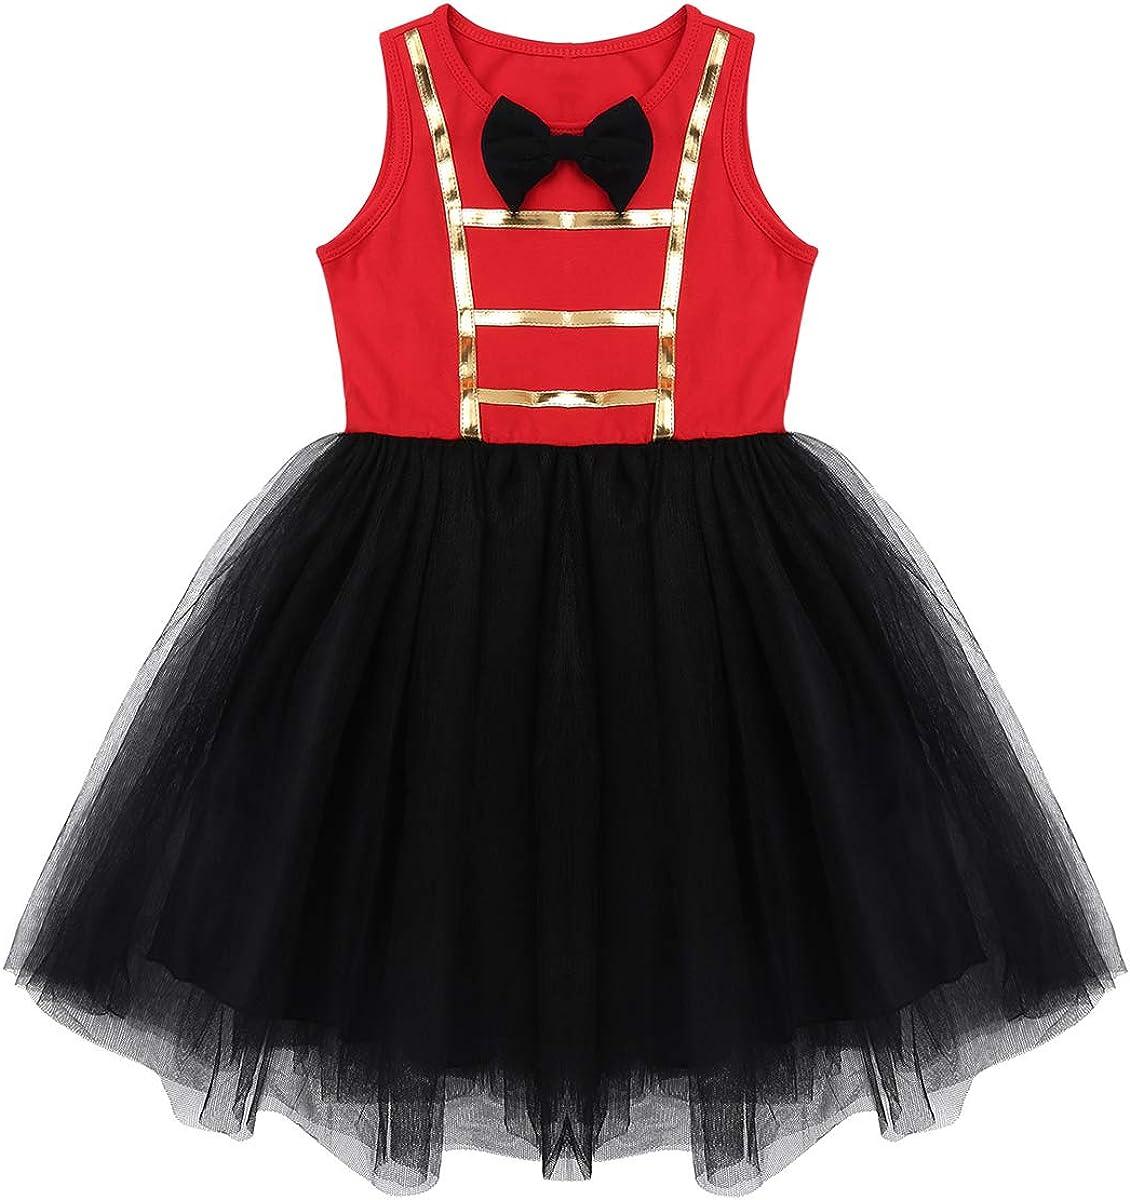 Moggemol Girls Ringmaster Circus Show Tassel Bowknot Tutu Dress with Steampunk Hat Festival Dancewear